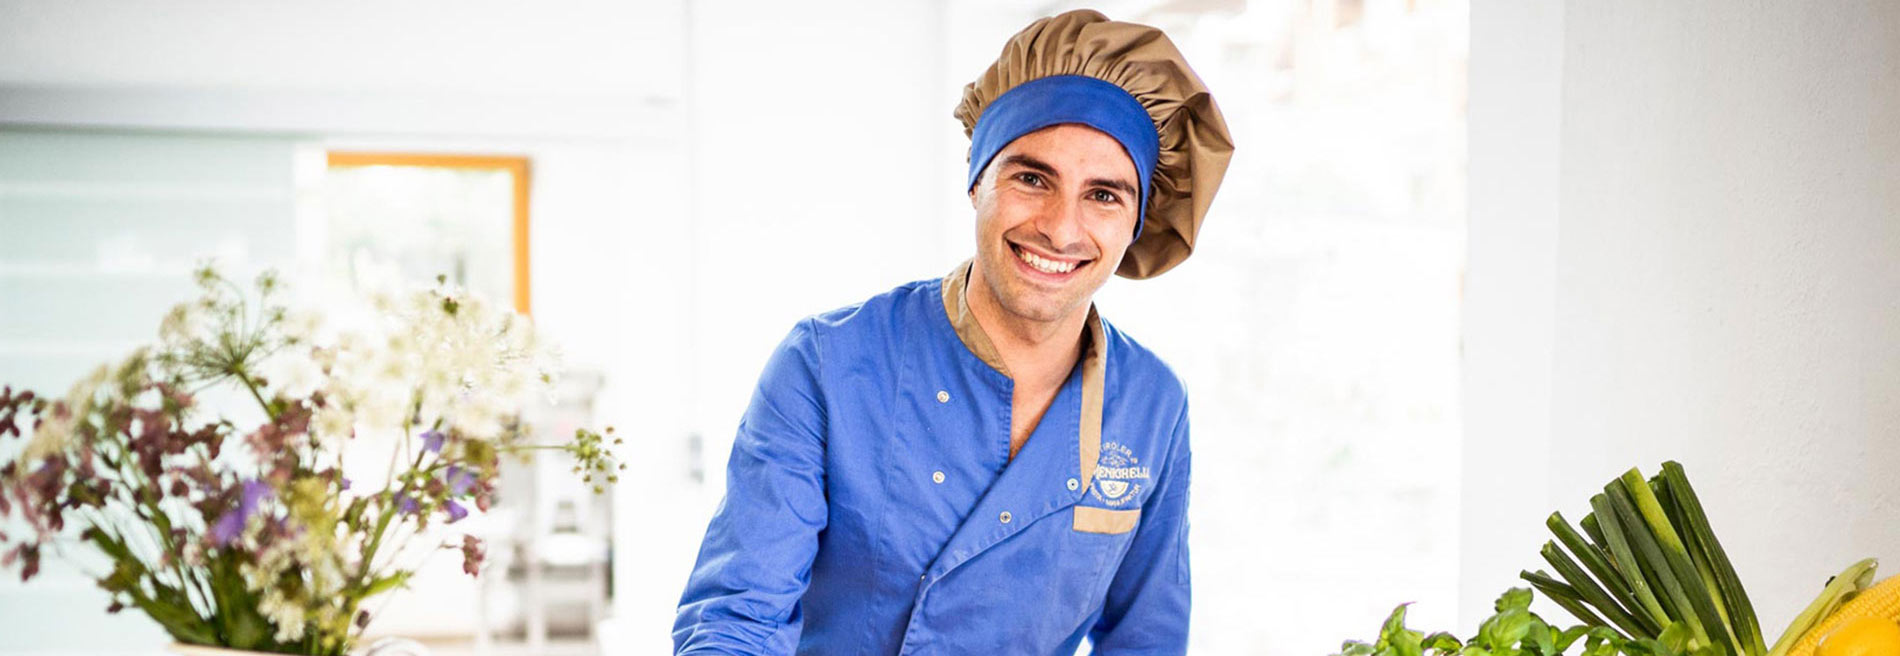 Andrea Menichelli von Tiroler Pasta Manufaktur